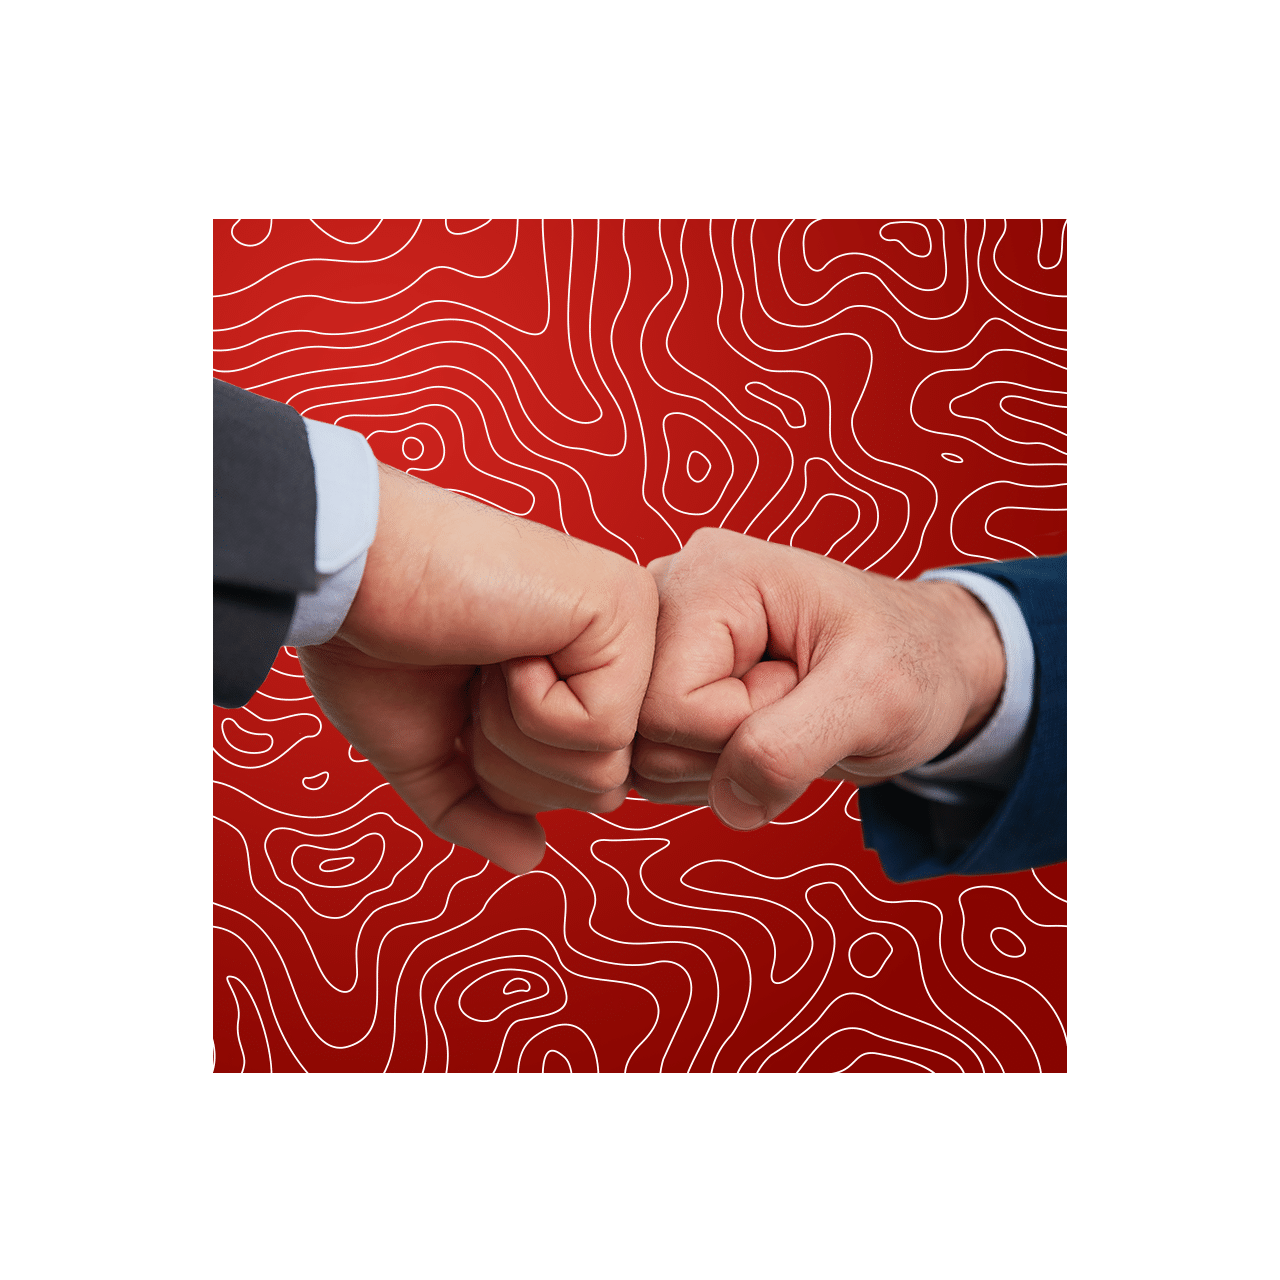 belief system honour partnership